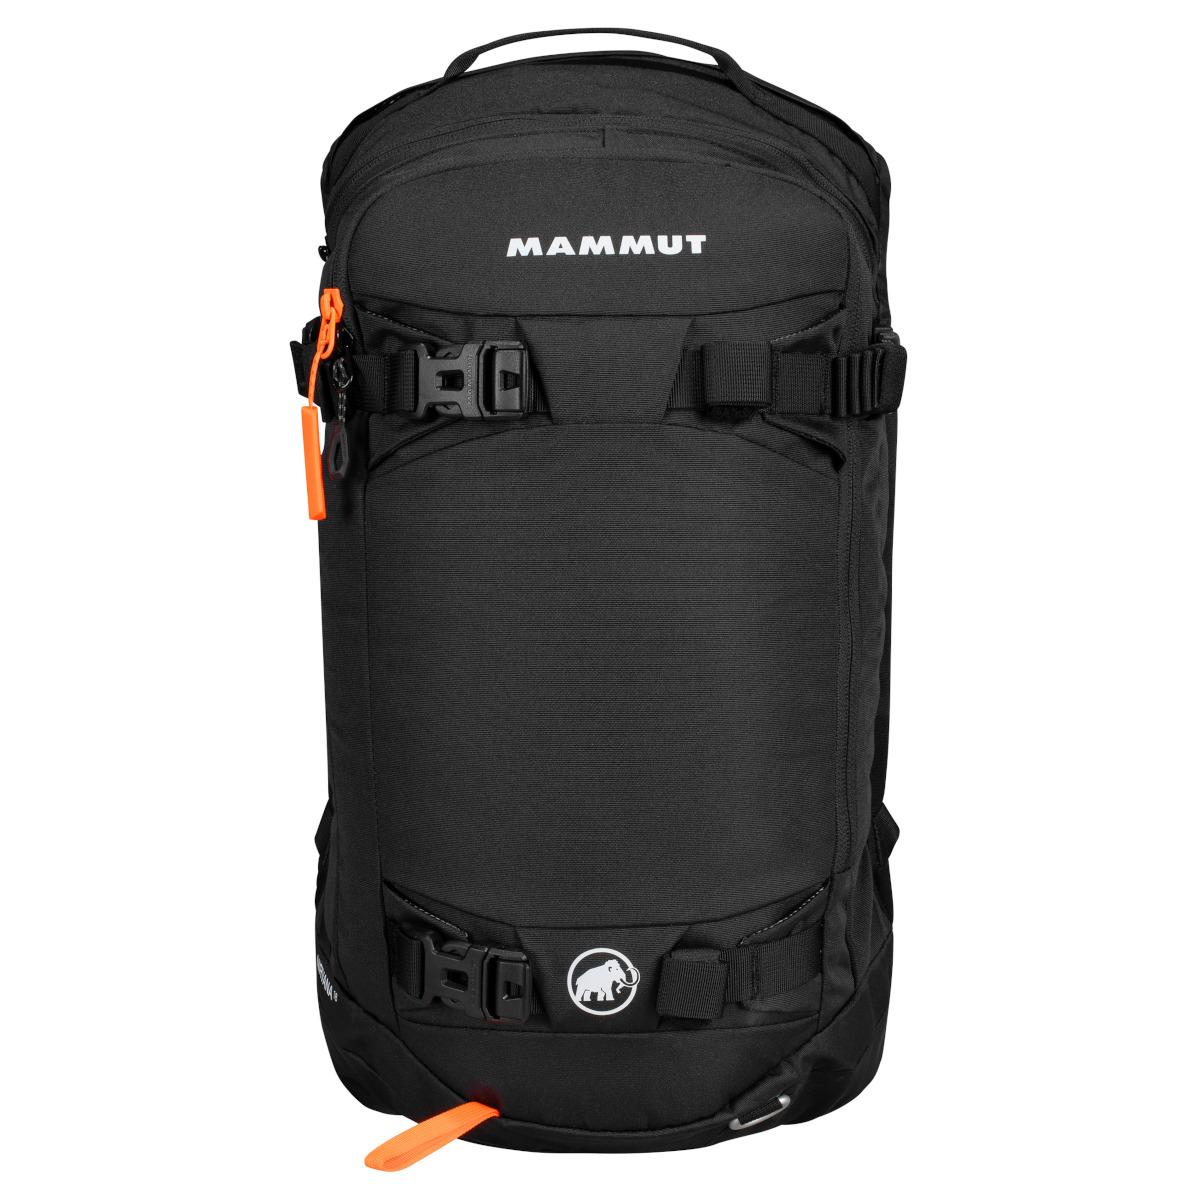 Image of Mammut Nirvana 18 Backpack - black